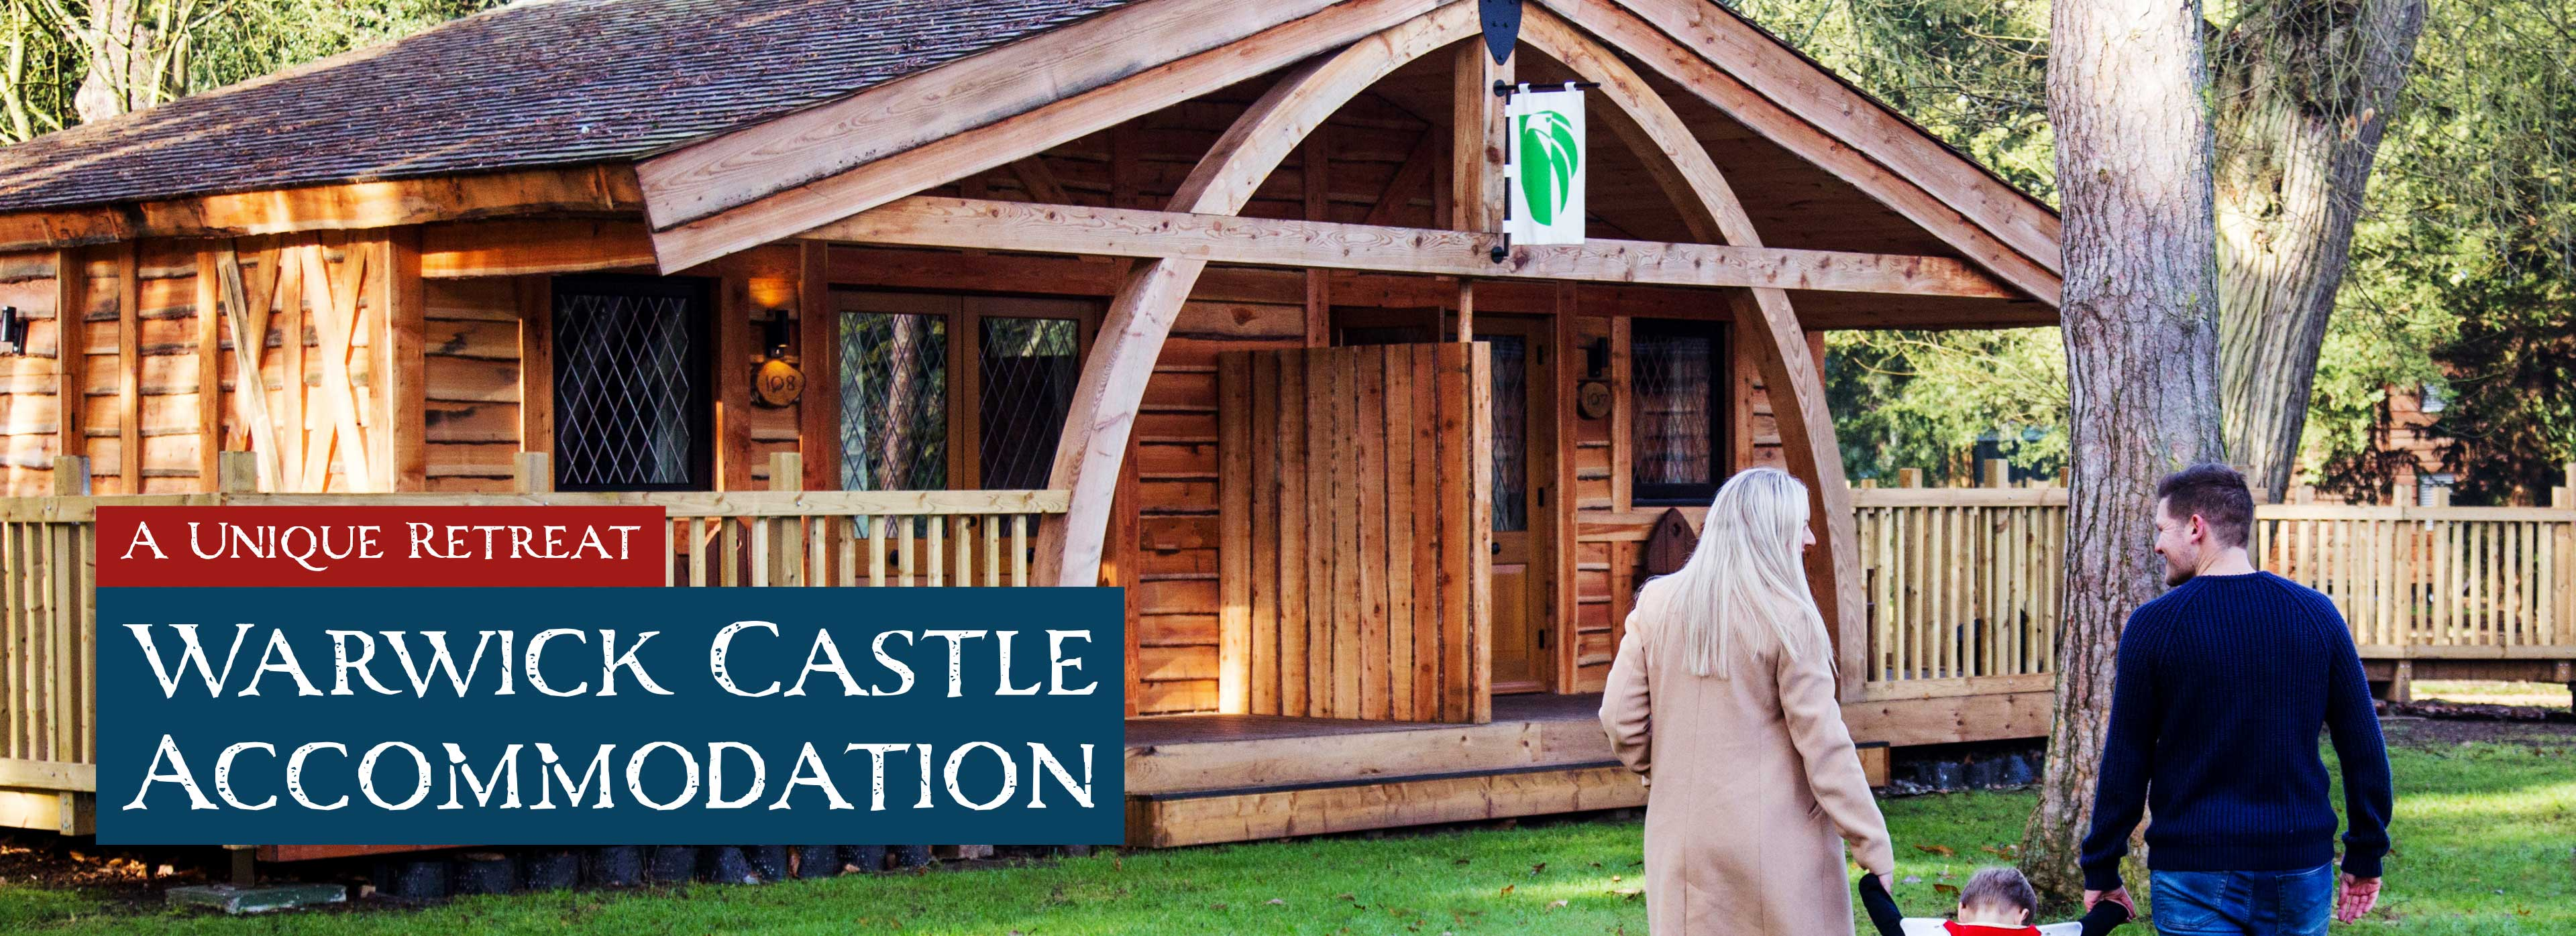 Warwick Castle Accommodation